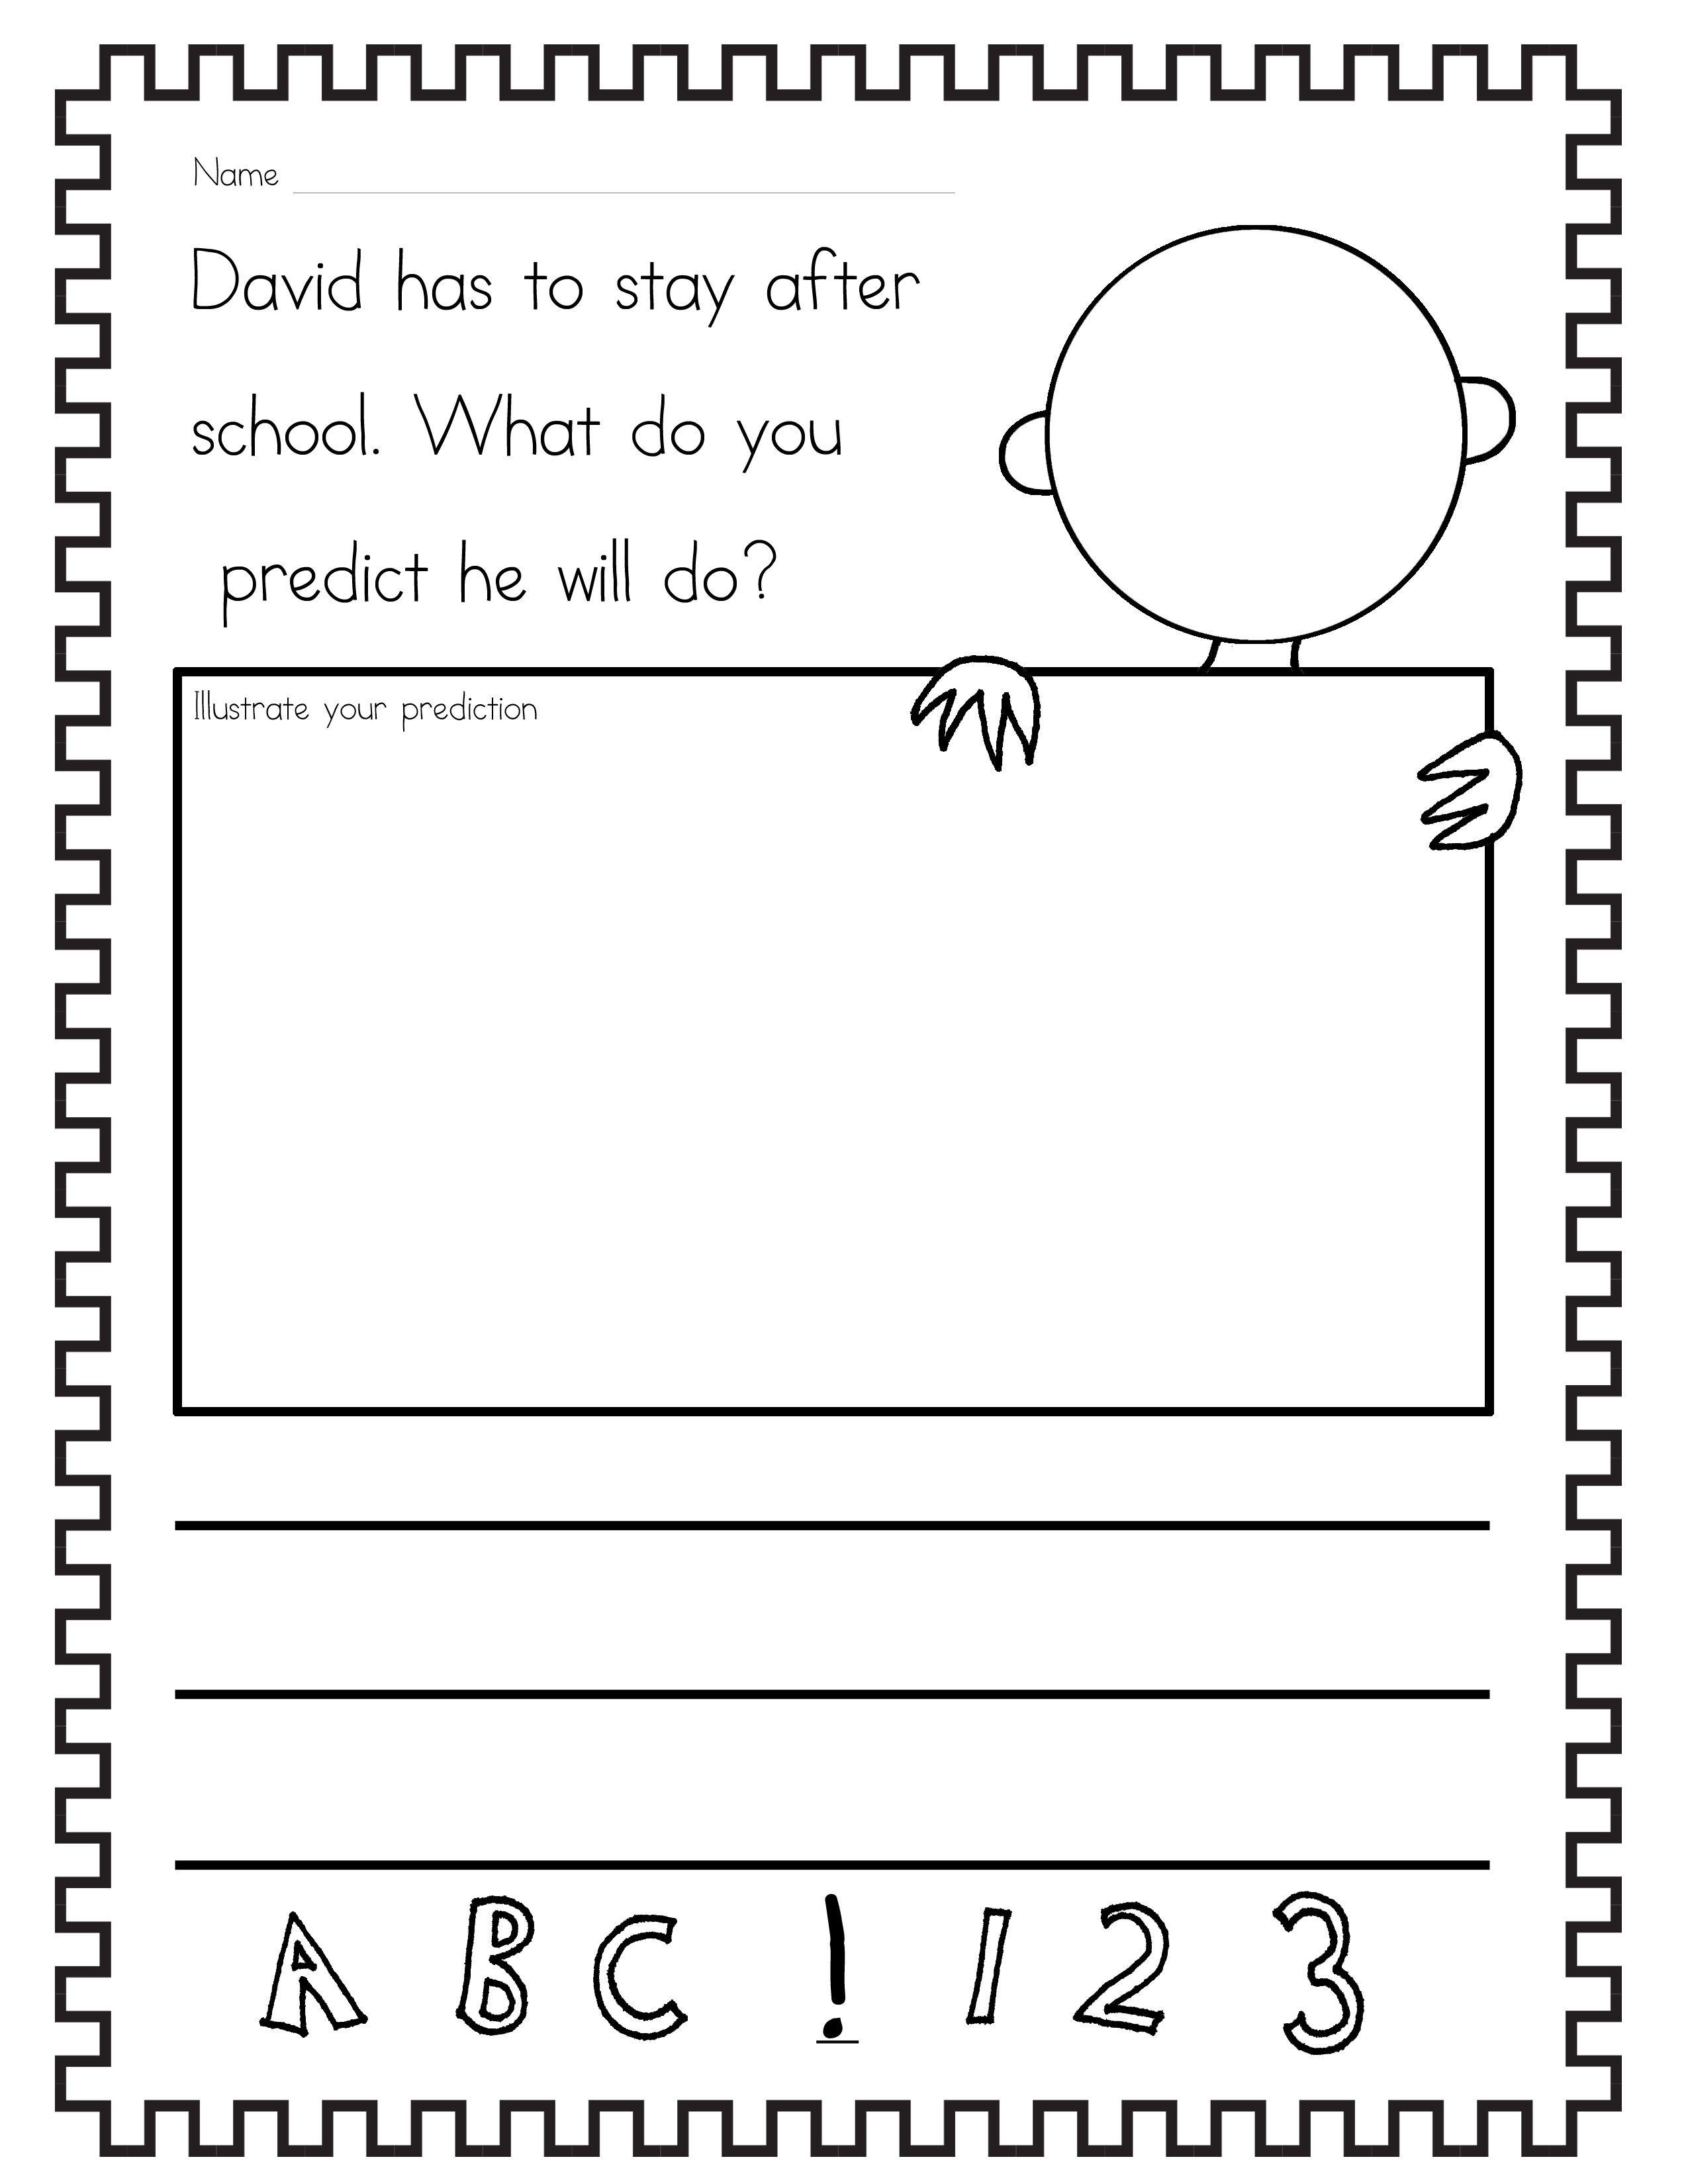 worksheet Prediction Worksheets free david goes to school prediction worksheet i started off by just reading david